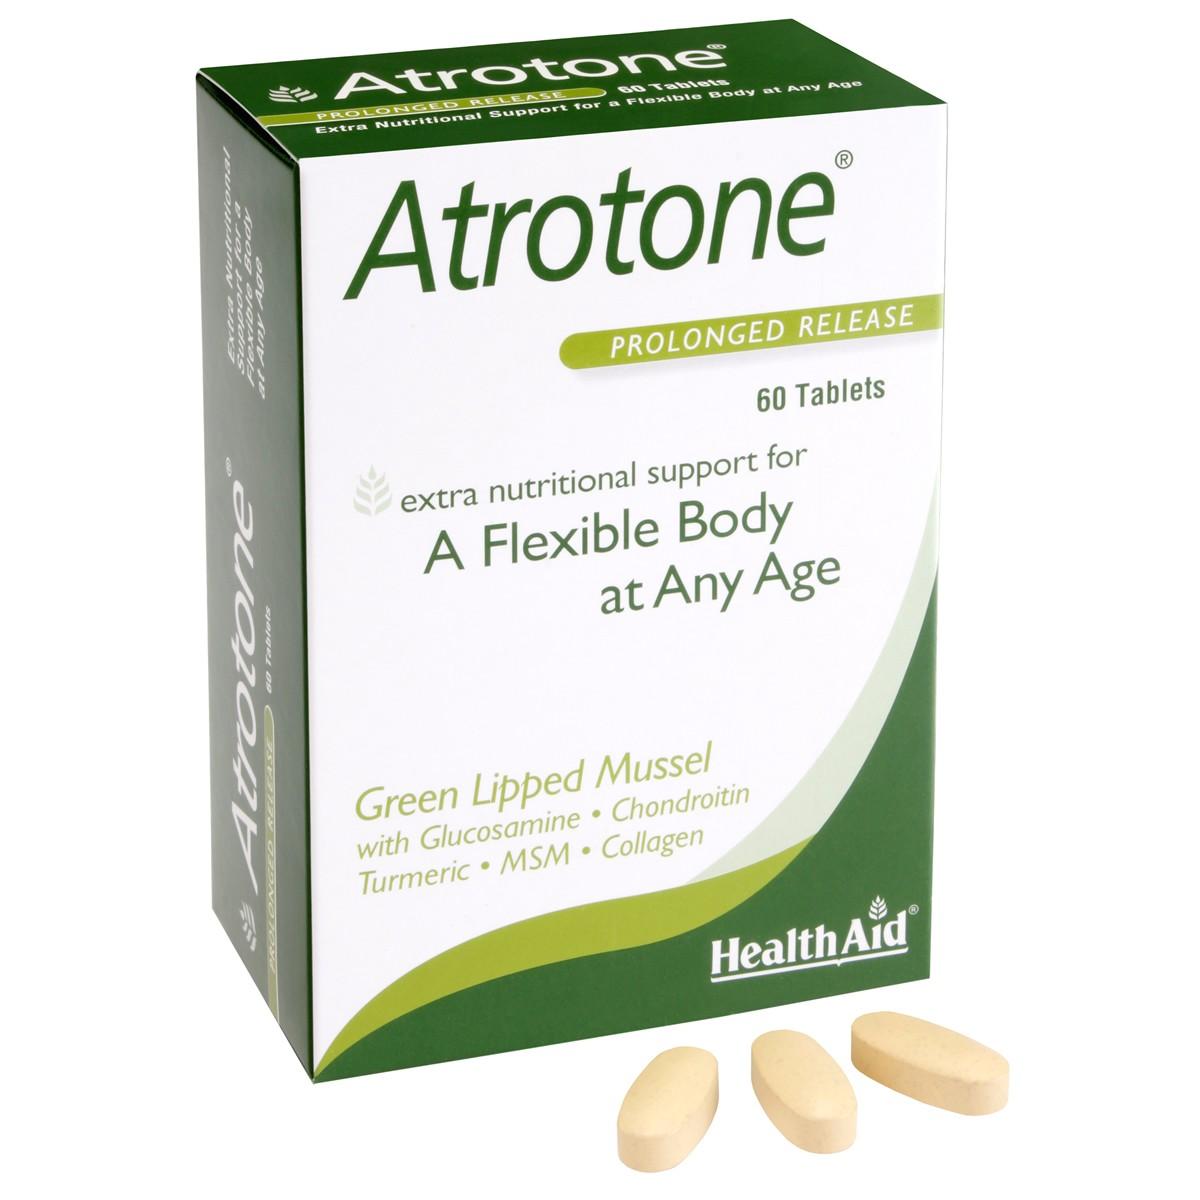 HealthAid Atrotone Blister Pack